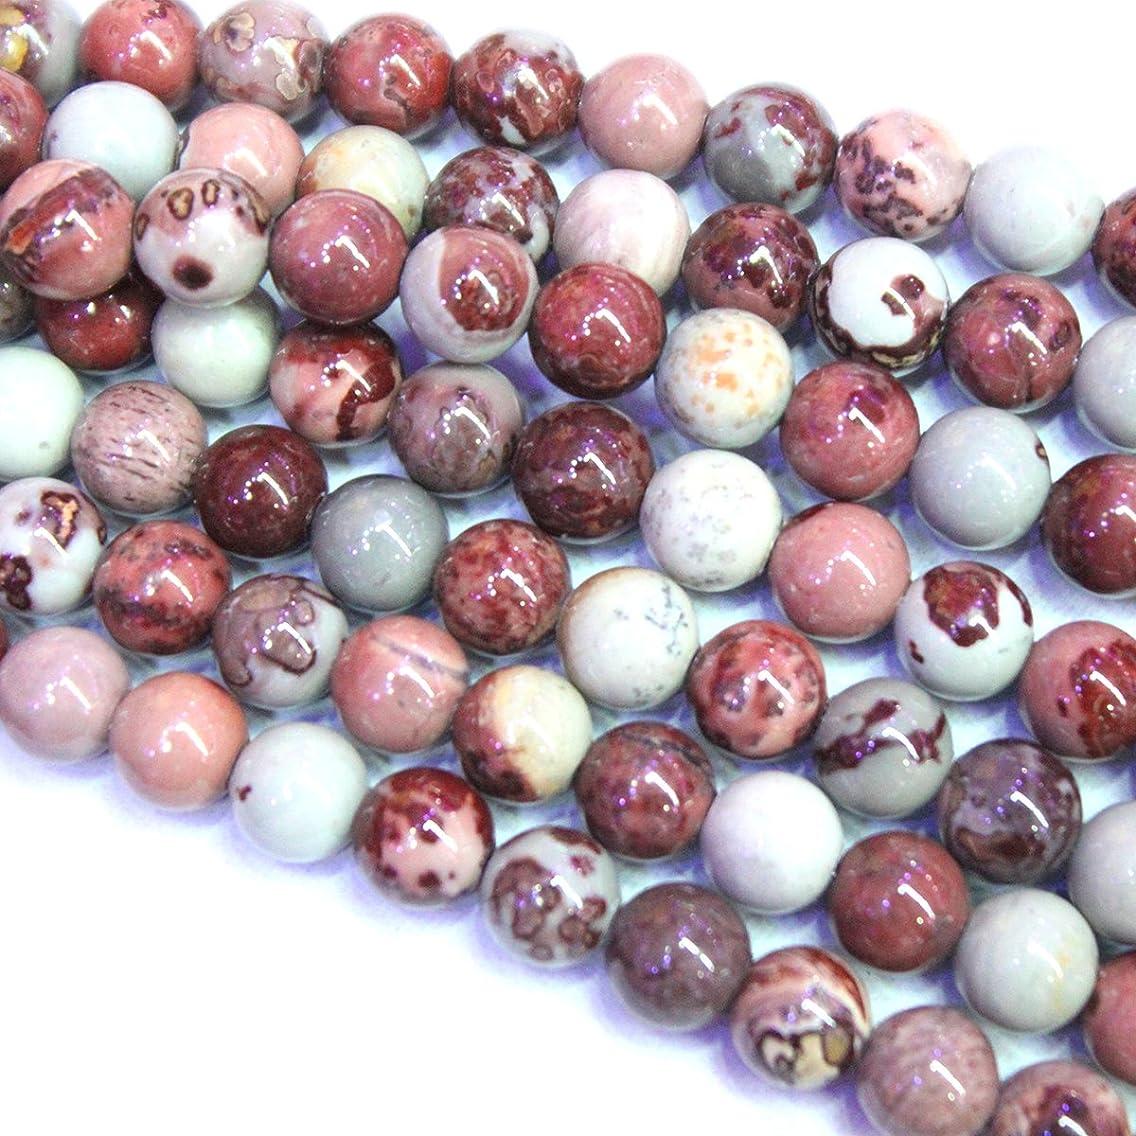 Natural Chouhua Artist Jasper Round 8mm Gemstone Loose Beads Jewerly Making Findings